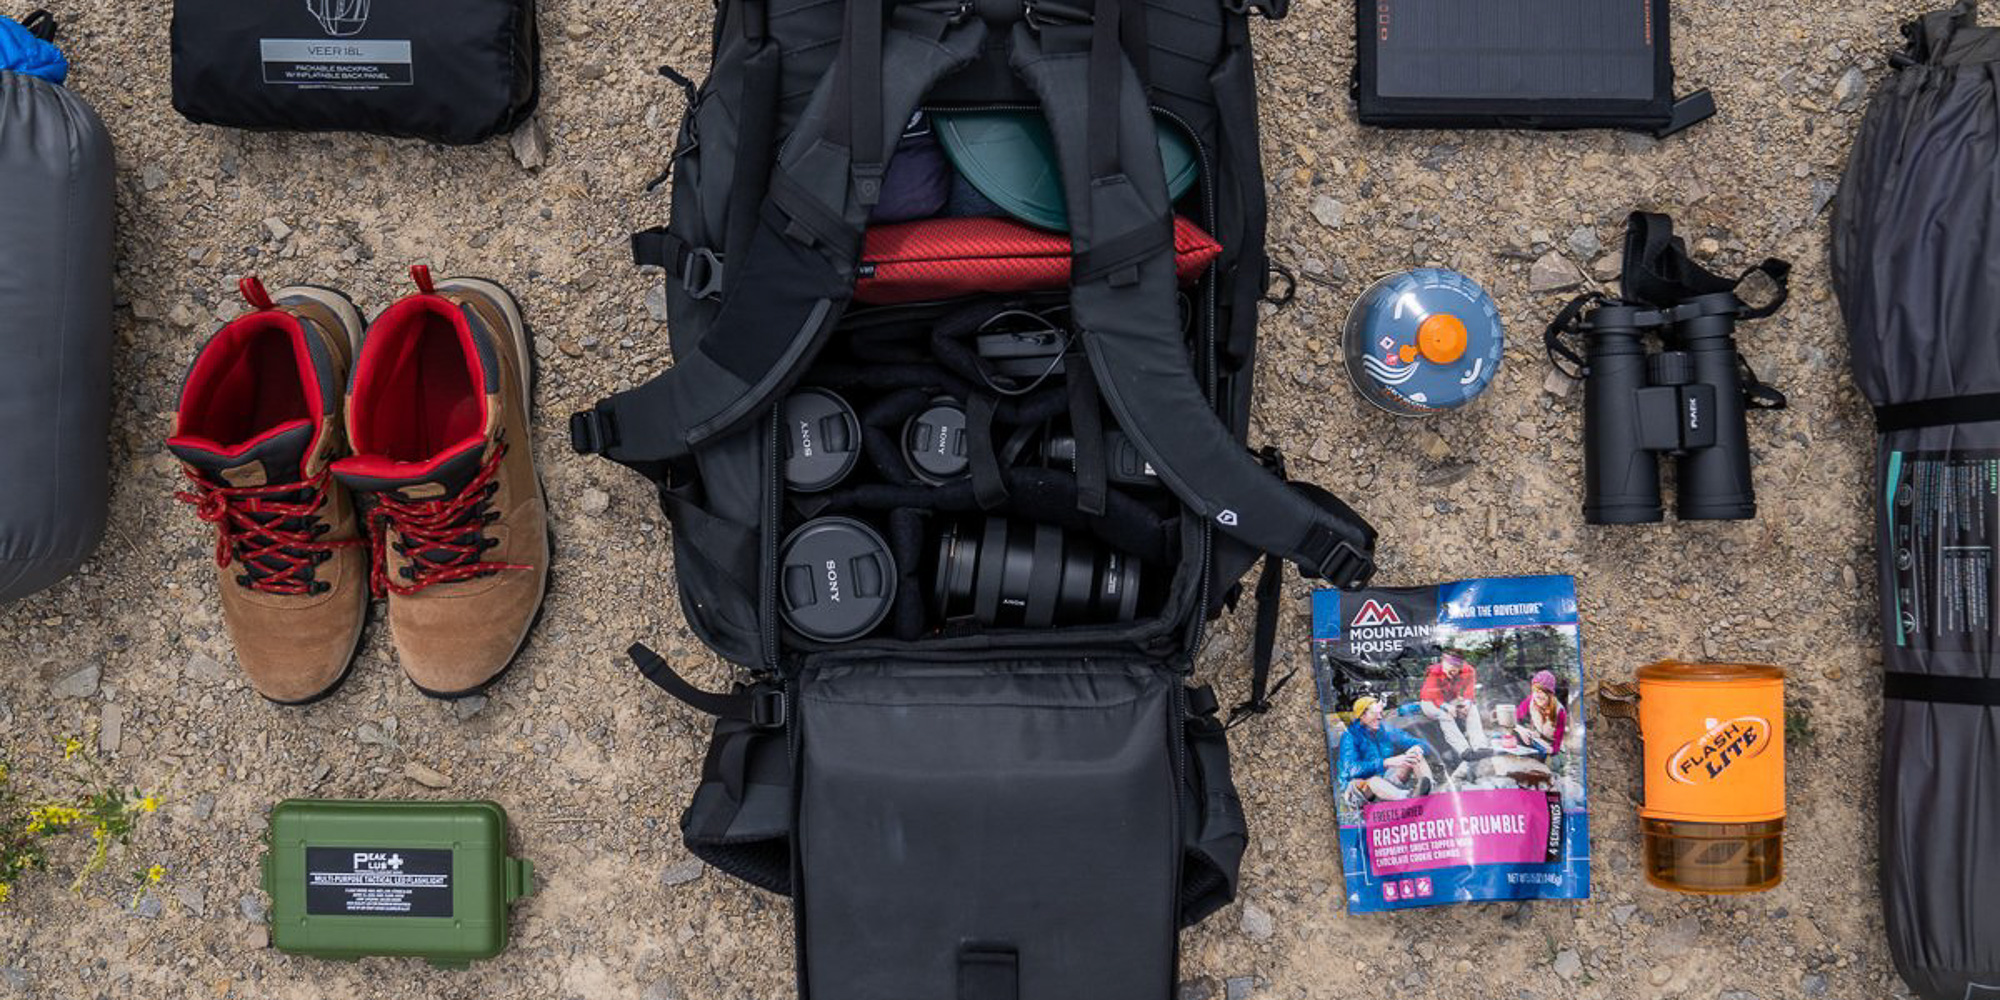 Wandrd Fernweh Trekking Backpack - Wandrd Camera Cube Photo Insert